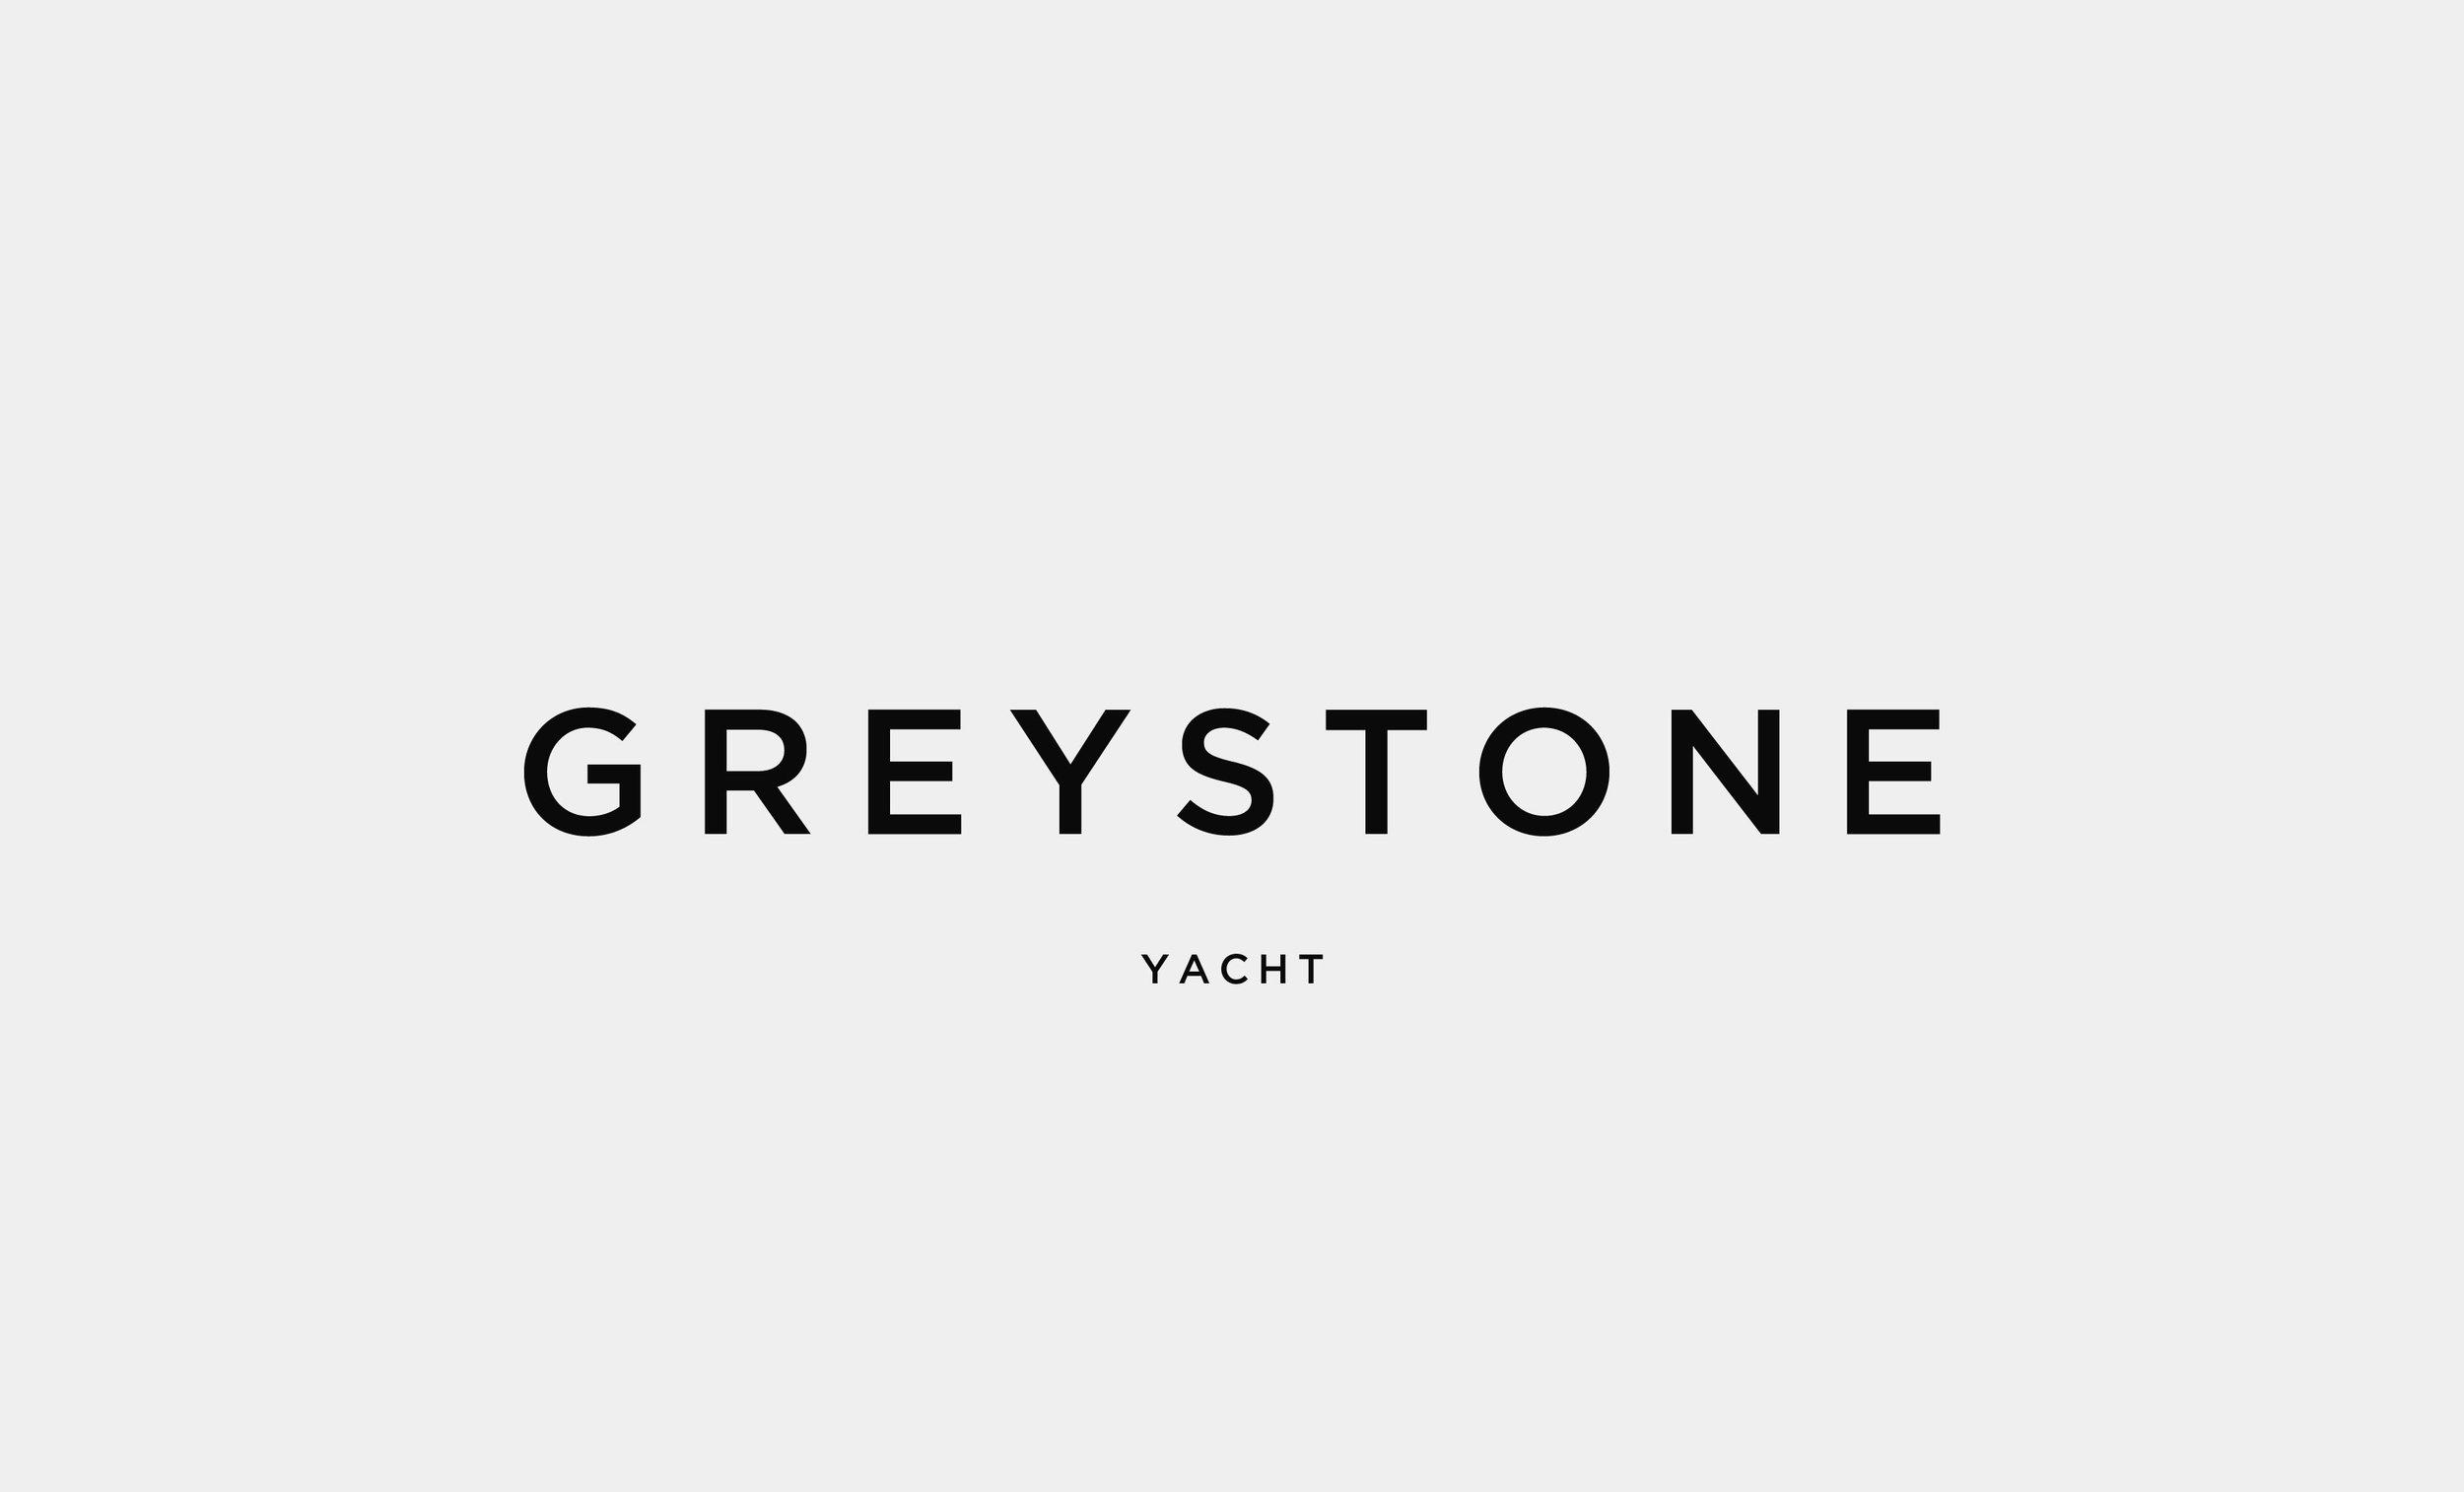 GREYSTONE-YACHT-LOGO.jpg